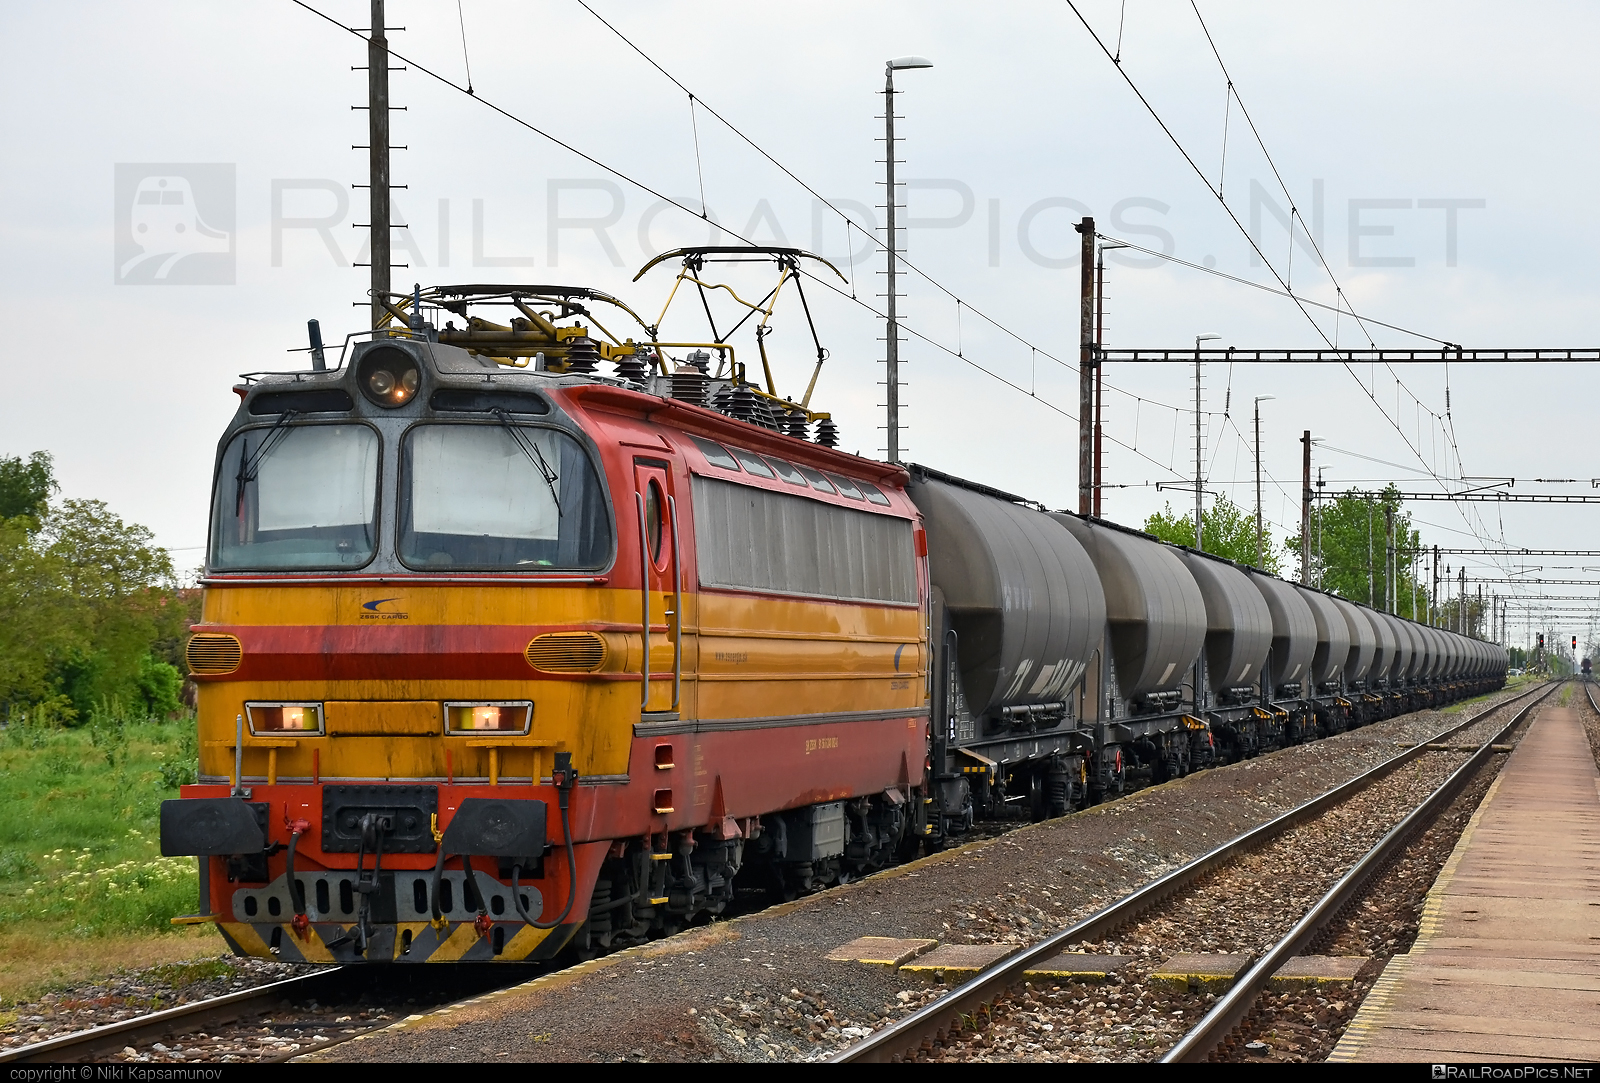 Škoda 47E - 240 082-8 operated by Železničná Spoločnost' Cargo Slovakia a.s. #ZeleznicnaSpolocnostCargoSlovakia #kesselwagen #laminatka #locomotive240 #skoda #skoda47e #tankwagon #zsskcargo